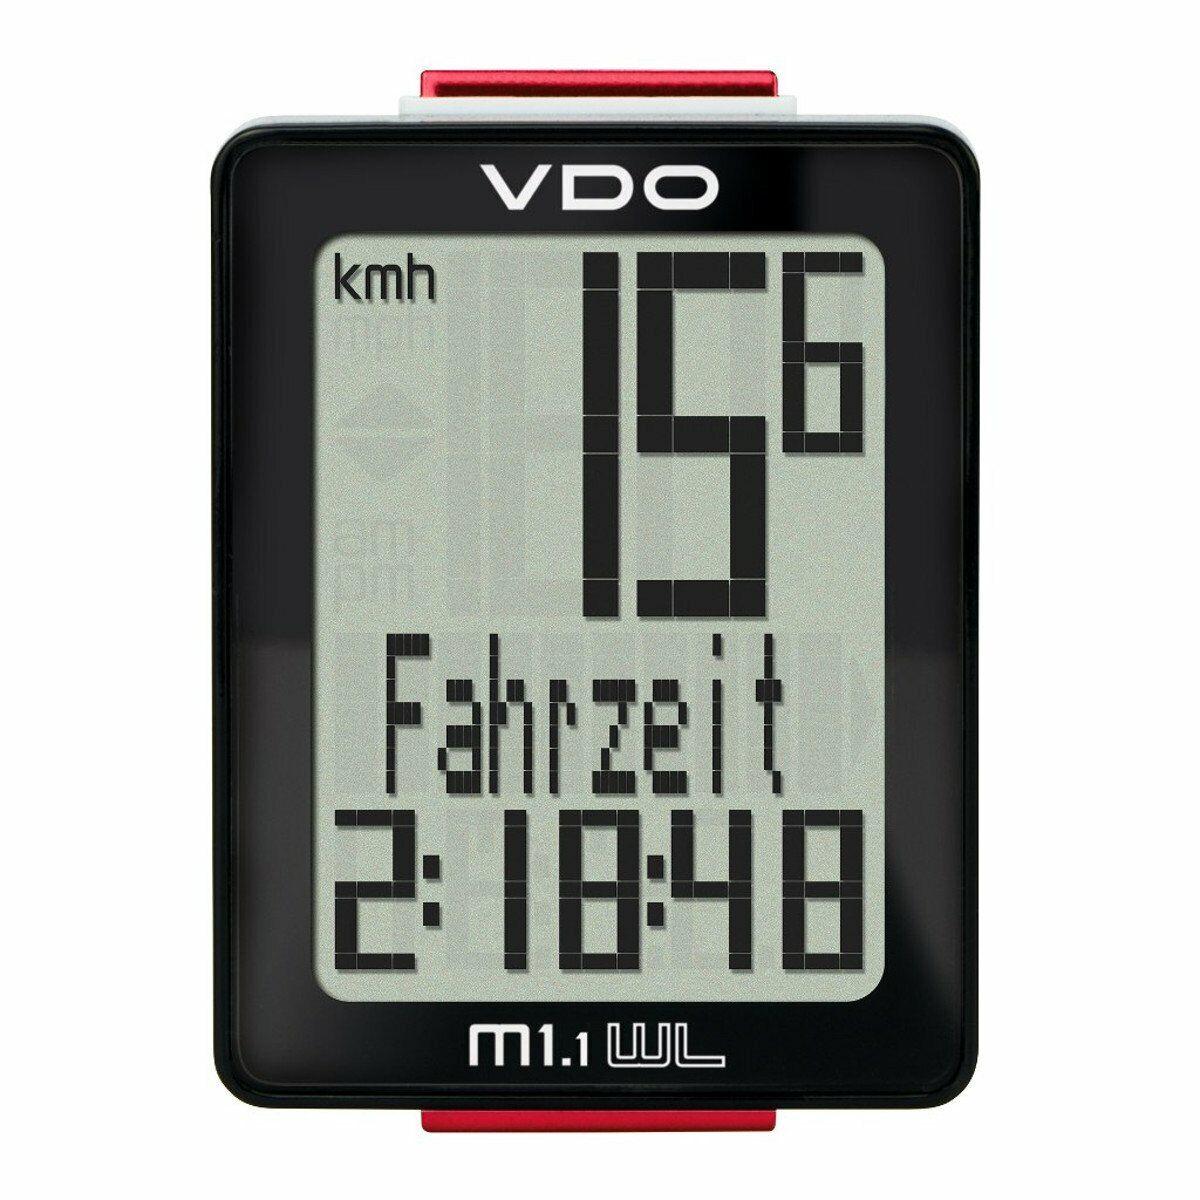 VDO M1.1 Wl Wire Cycle Computer Bike Speedometer